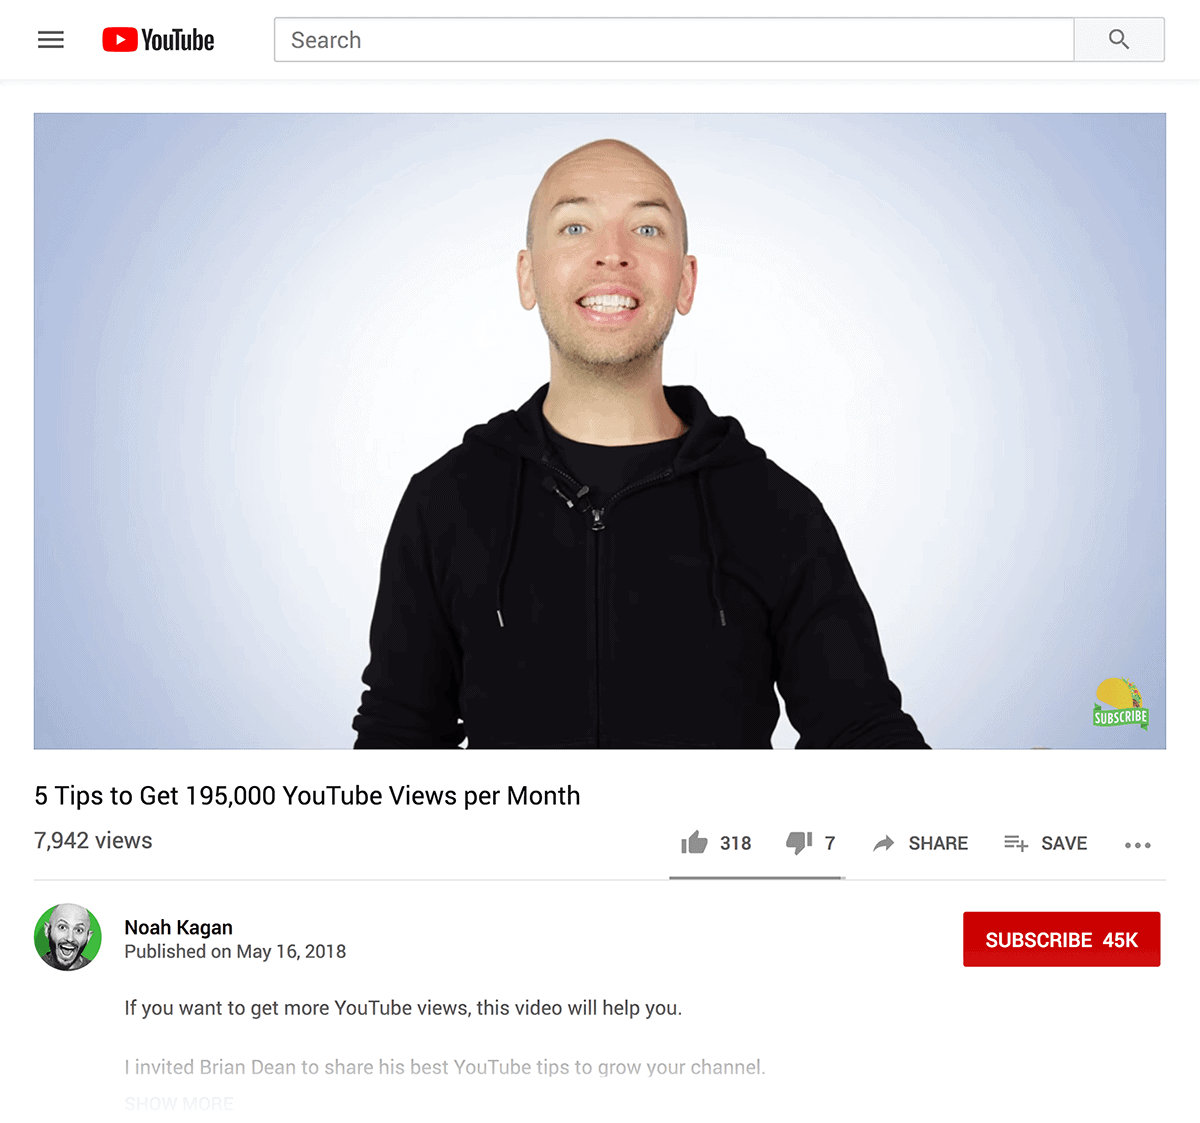 Noah Kagan guest video